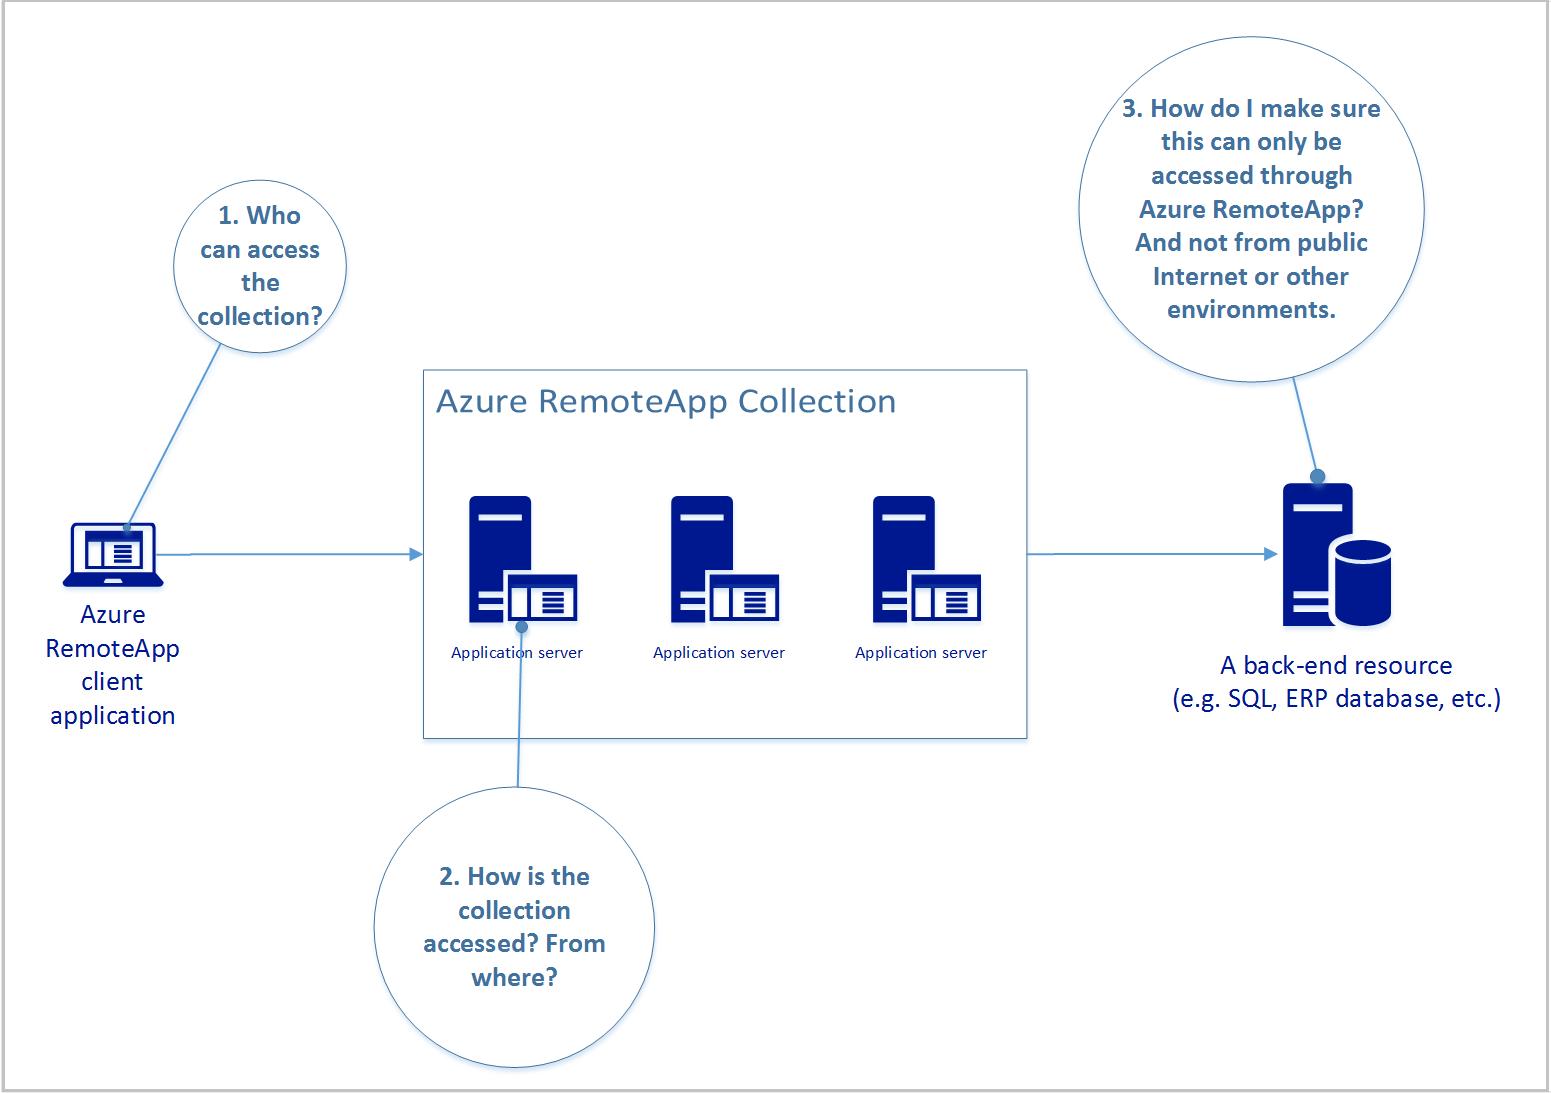 Secure Data - Azure RemoteApp